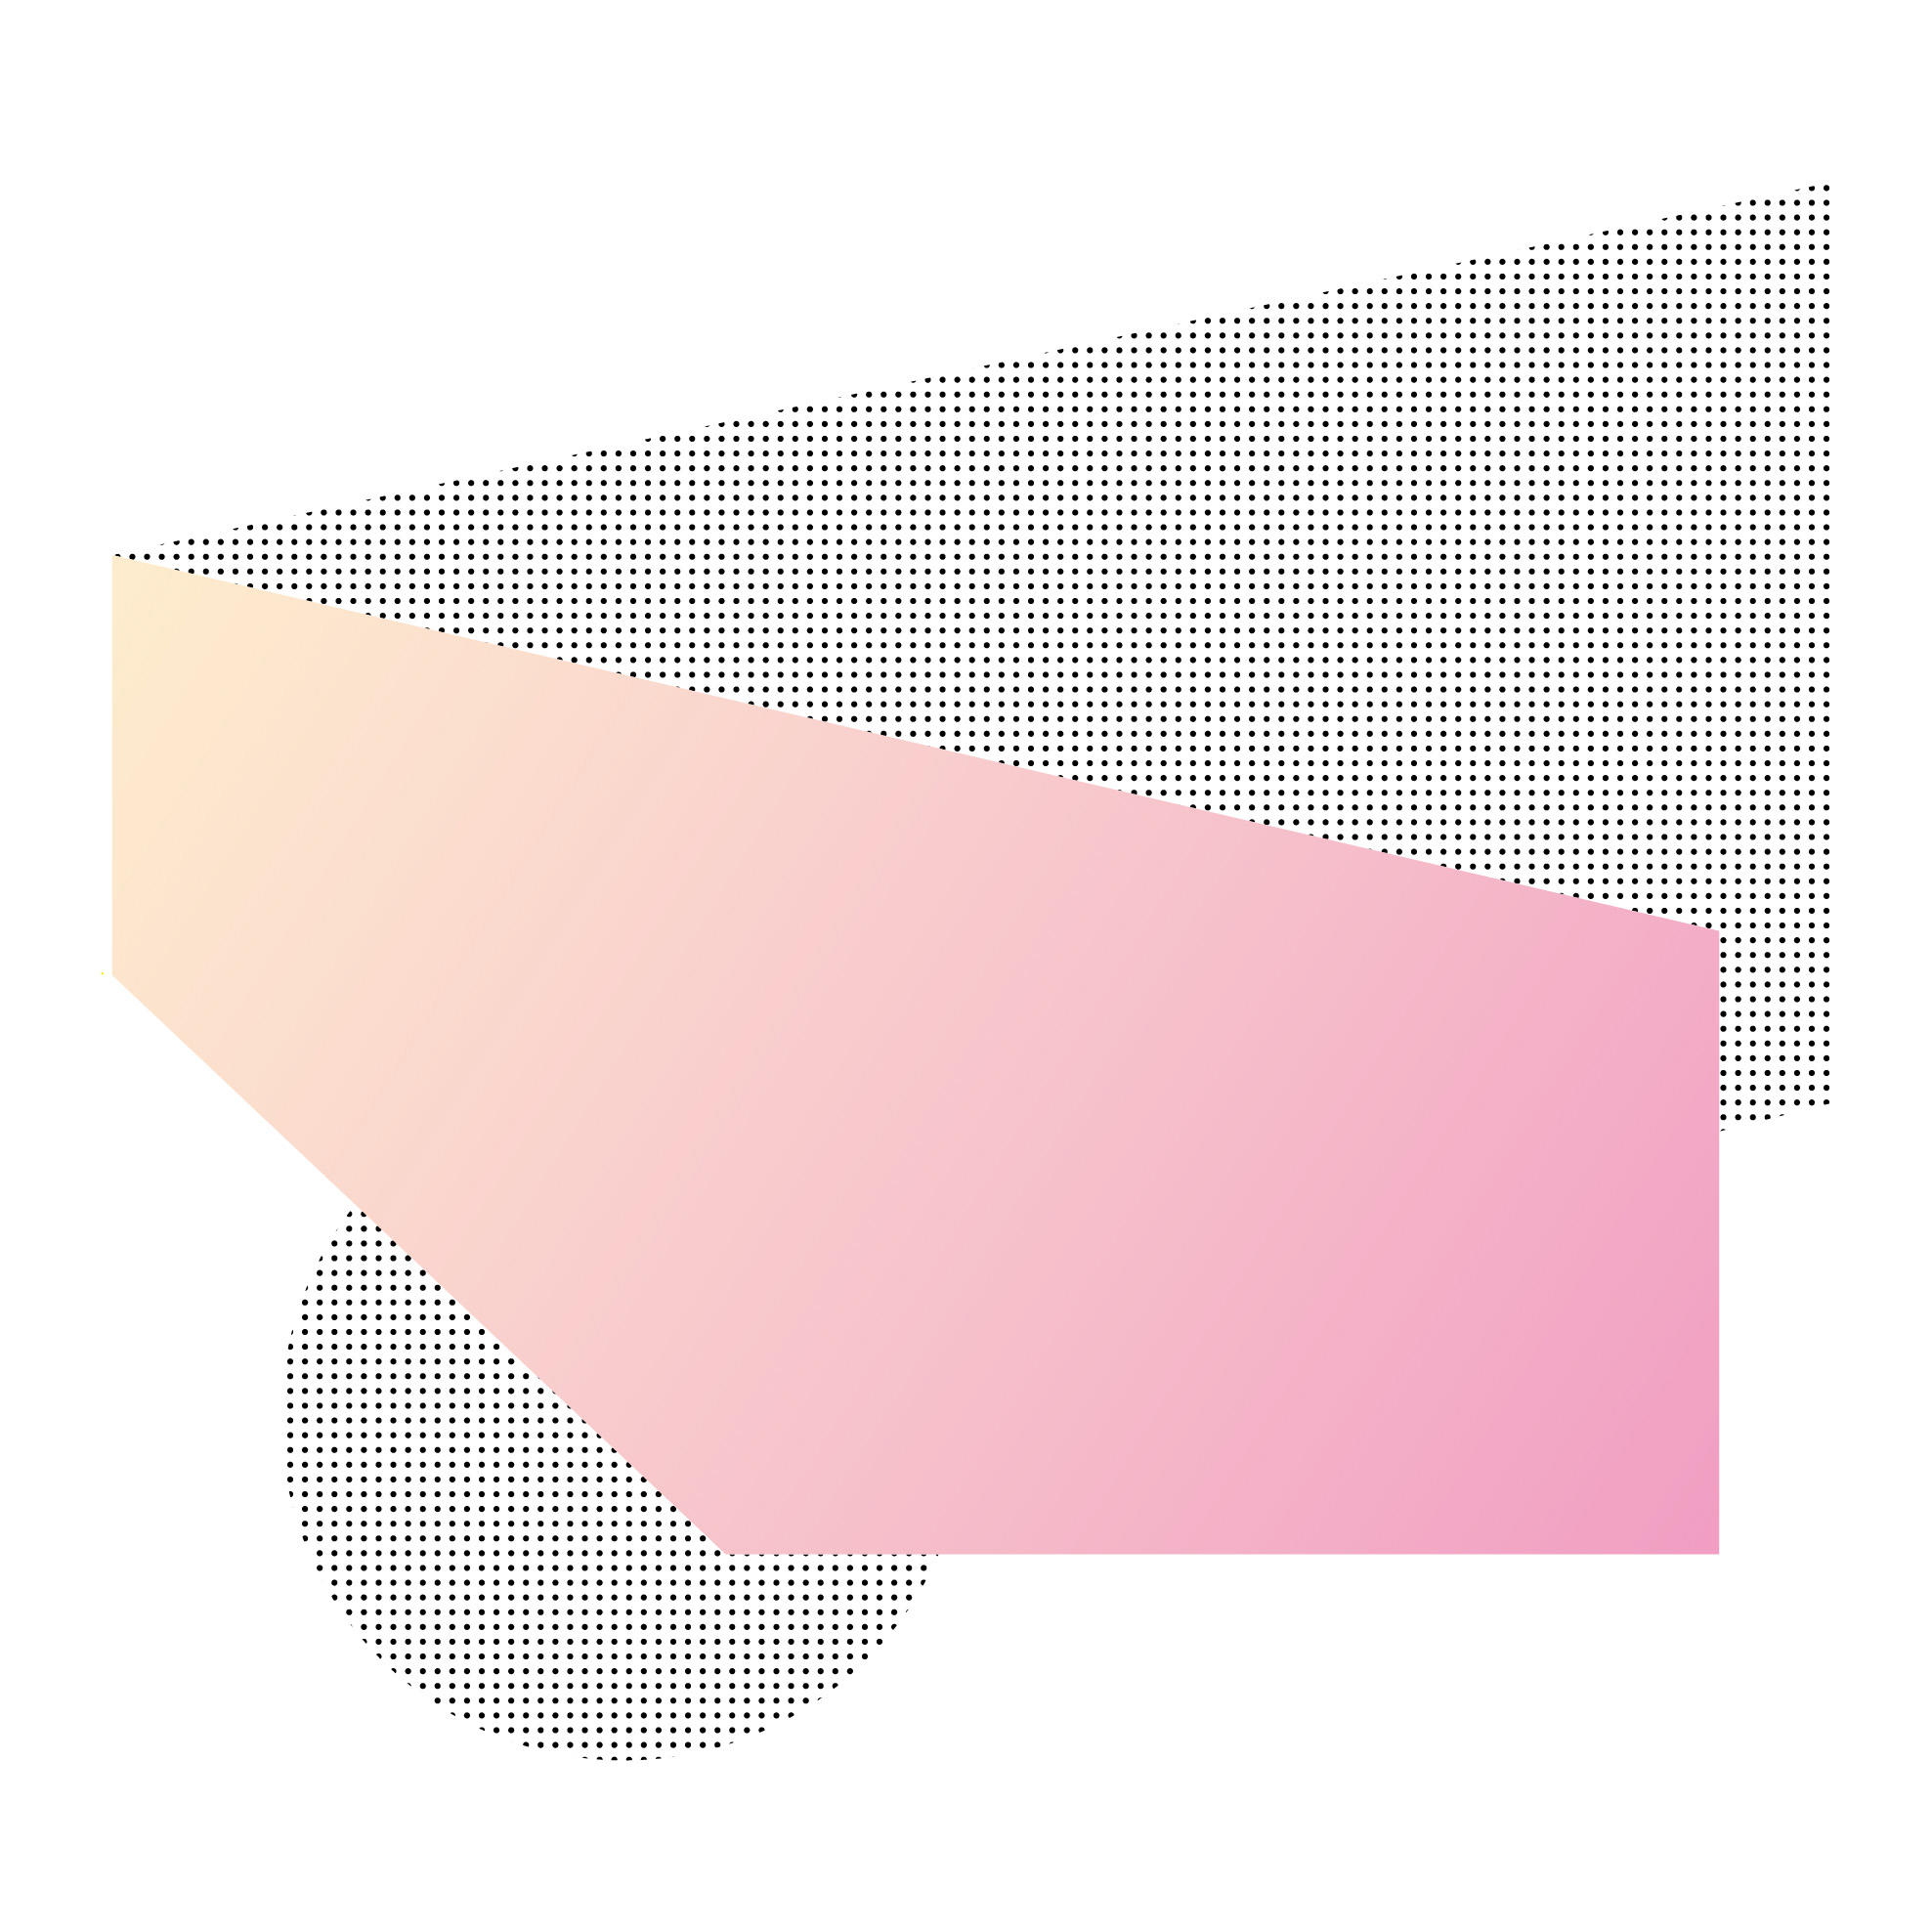 ALLES_LIEBE_nyukou0322_正方形.jpg